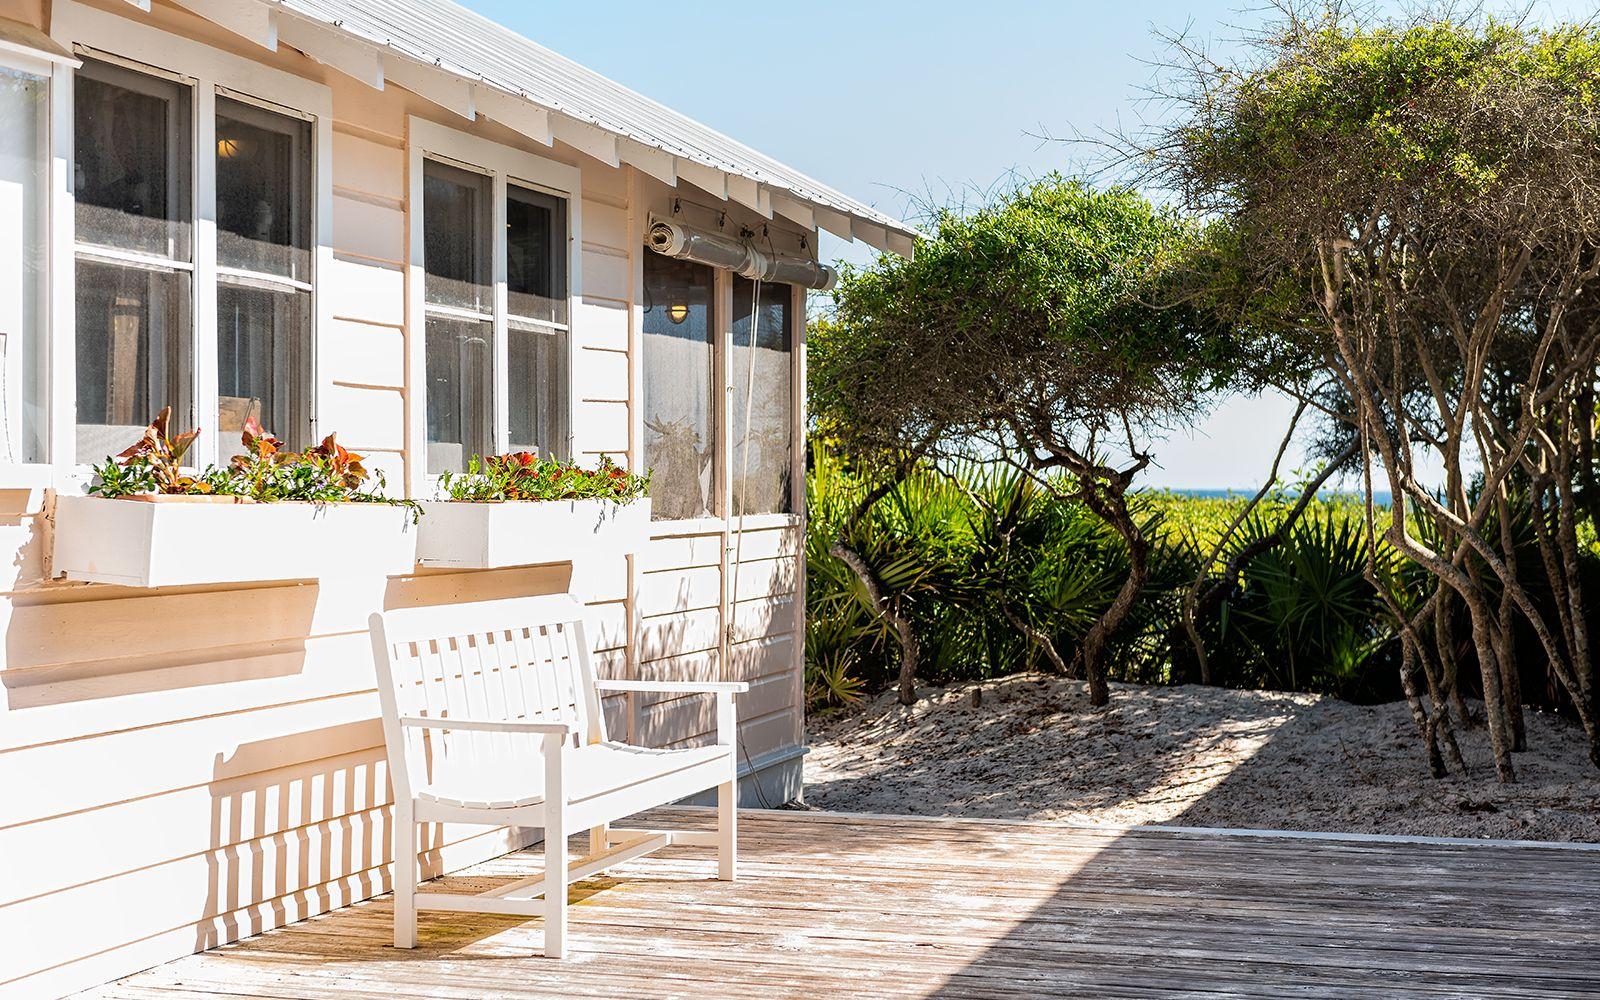 Bungalows On A Budget: 10 Affordable 'Shore Bets' Per Realtor.com